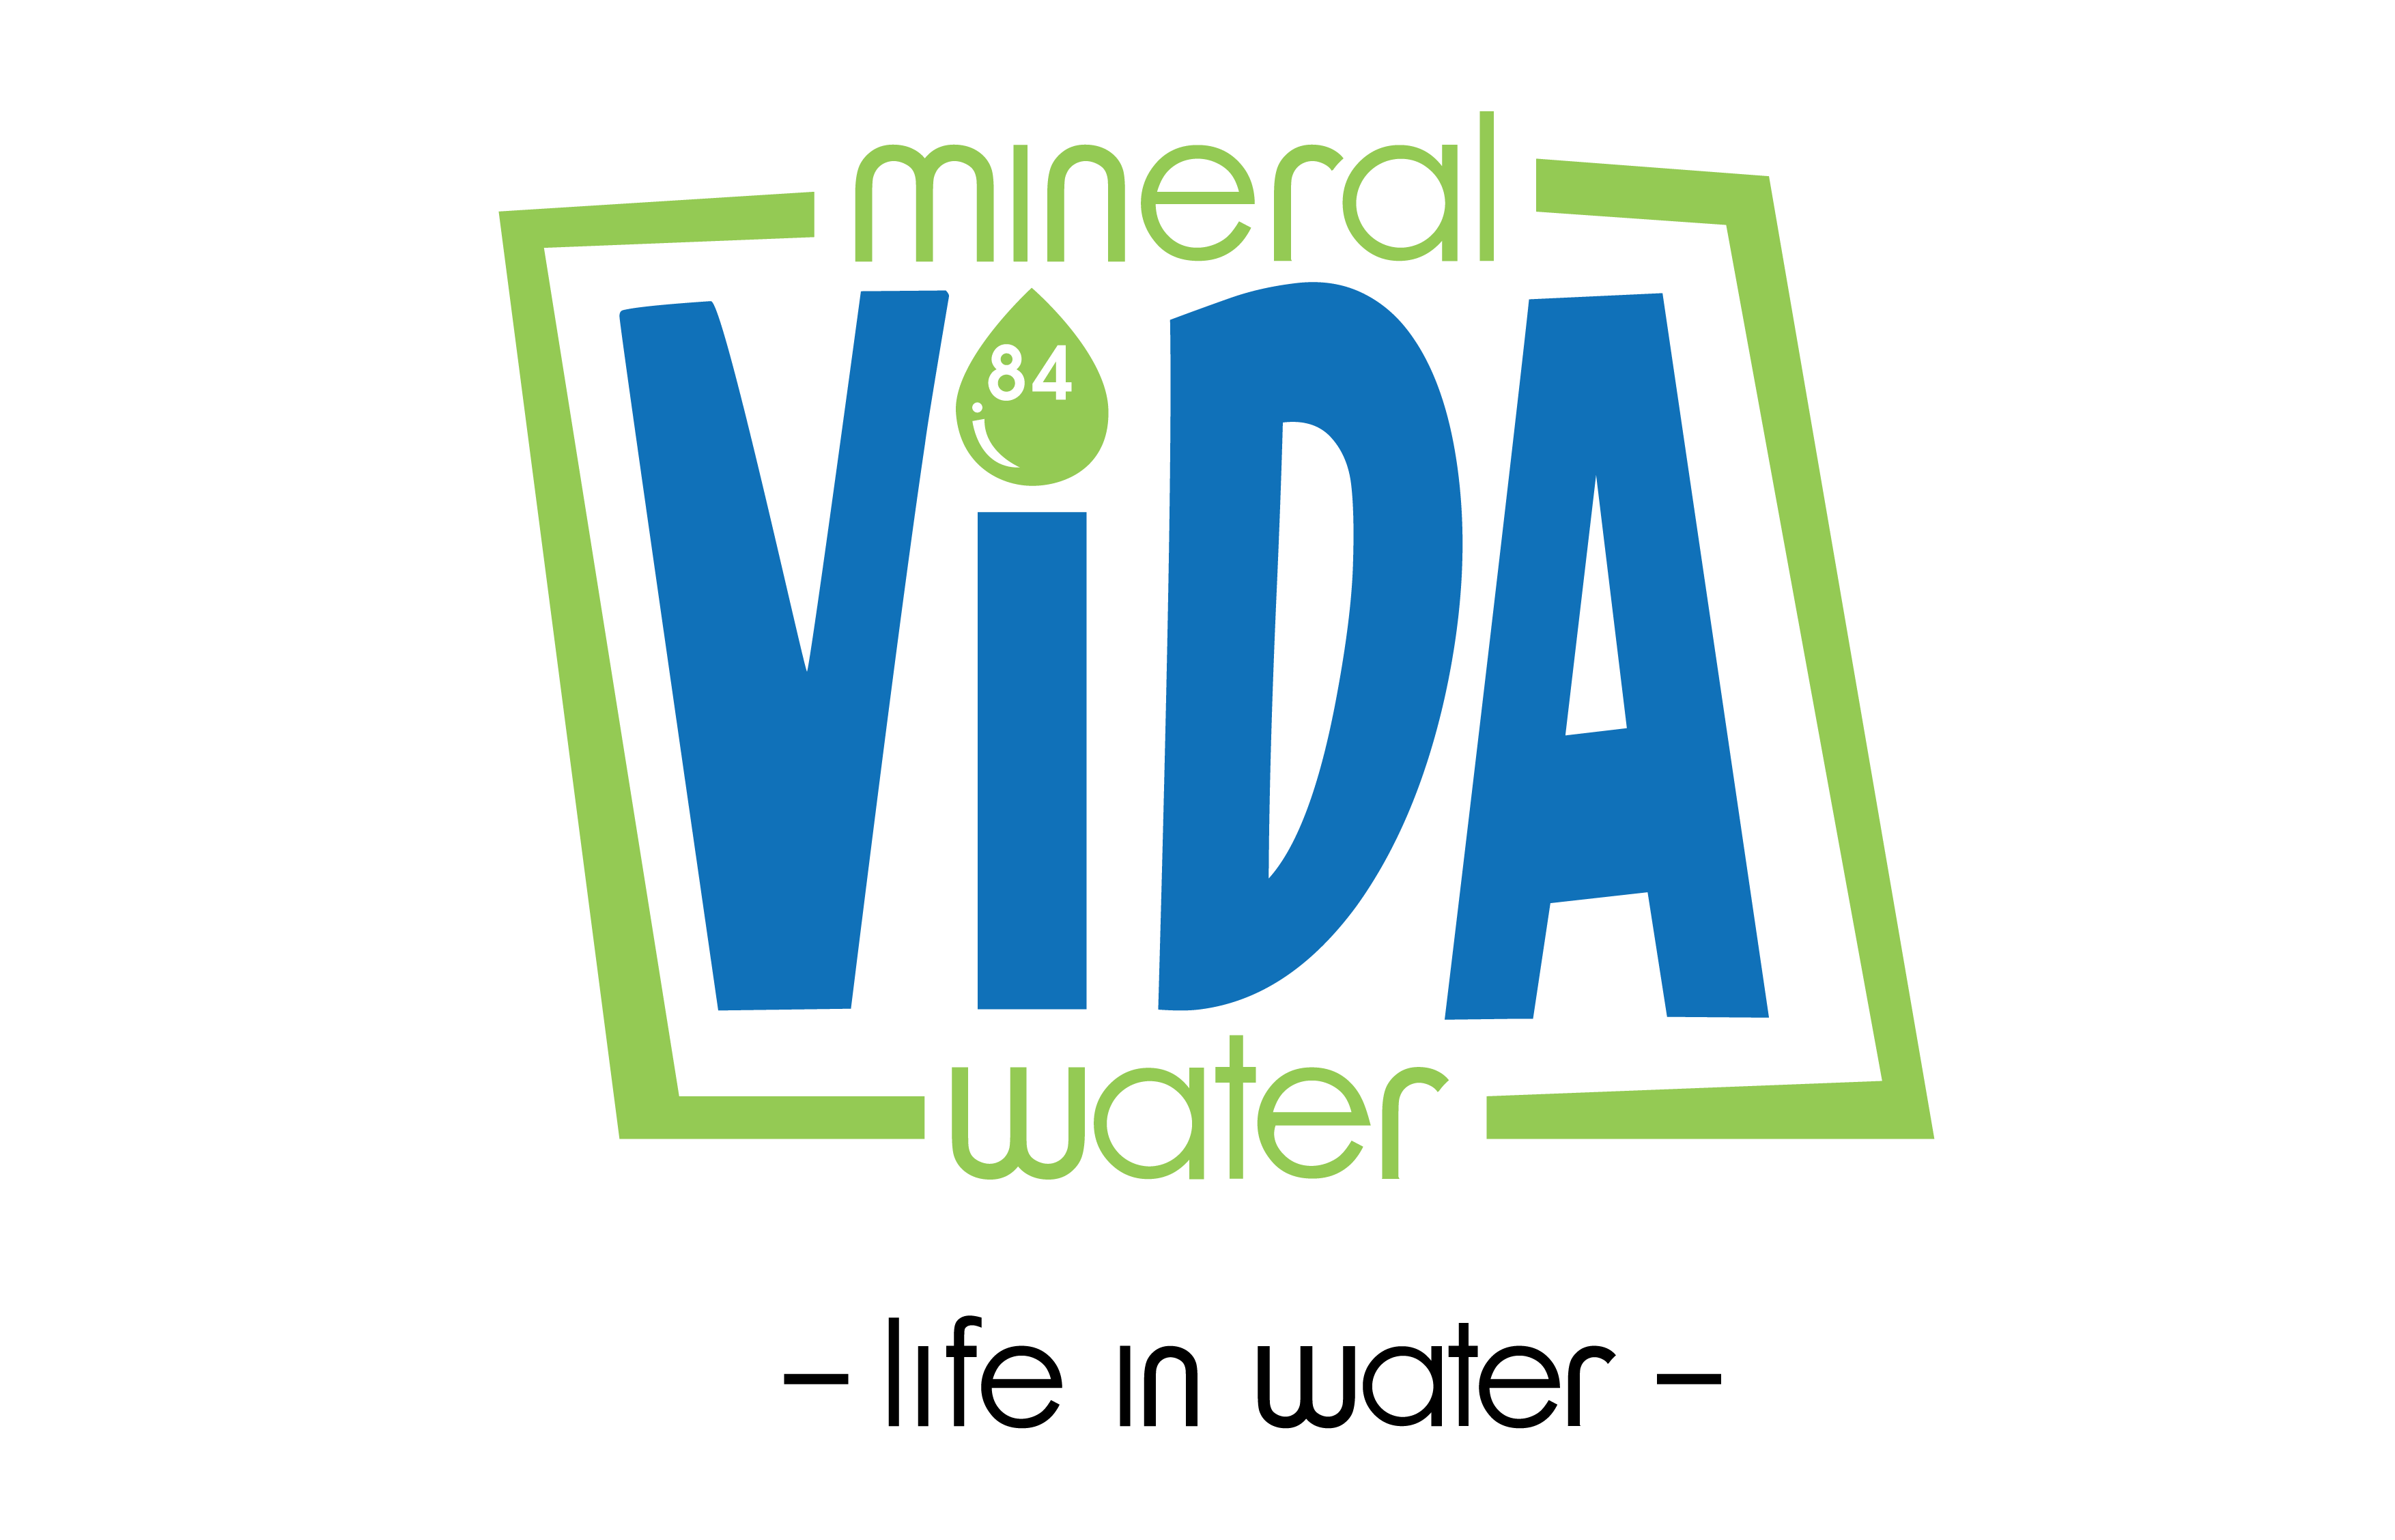 VIDA MINERAL WATER